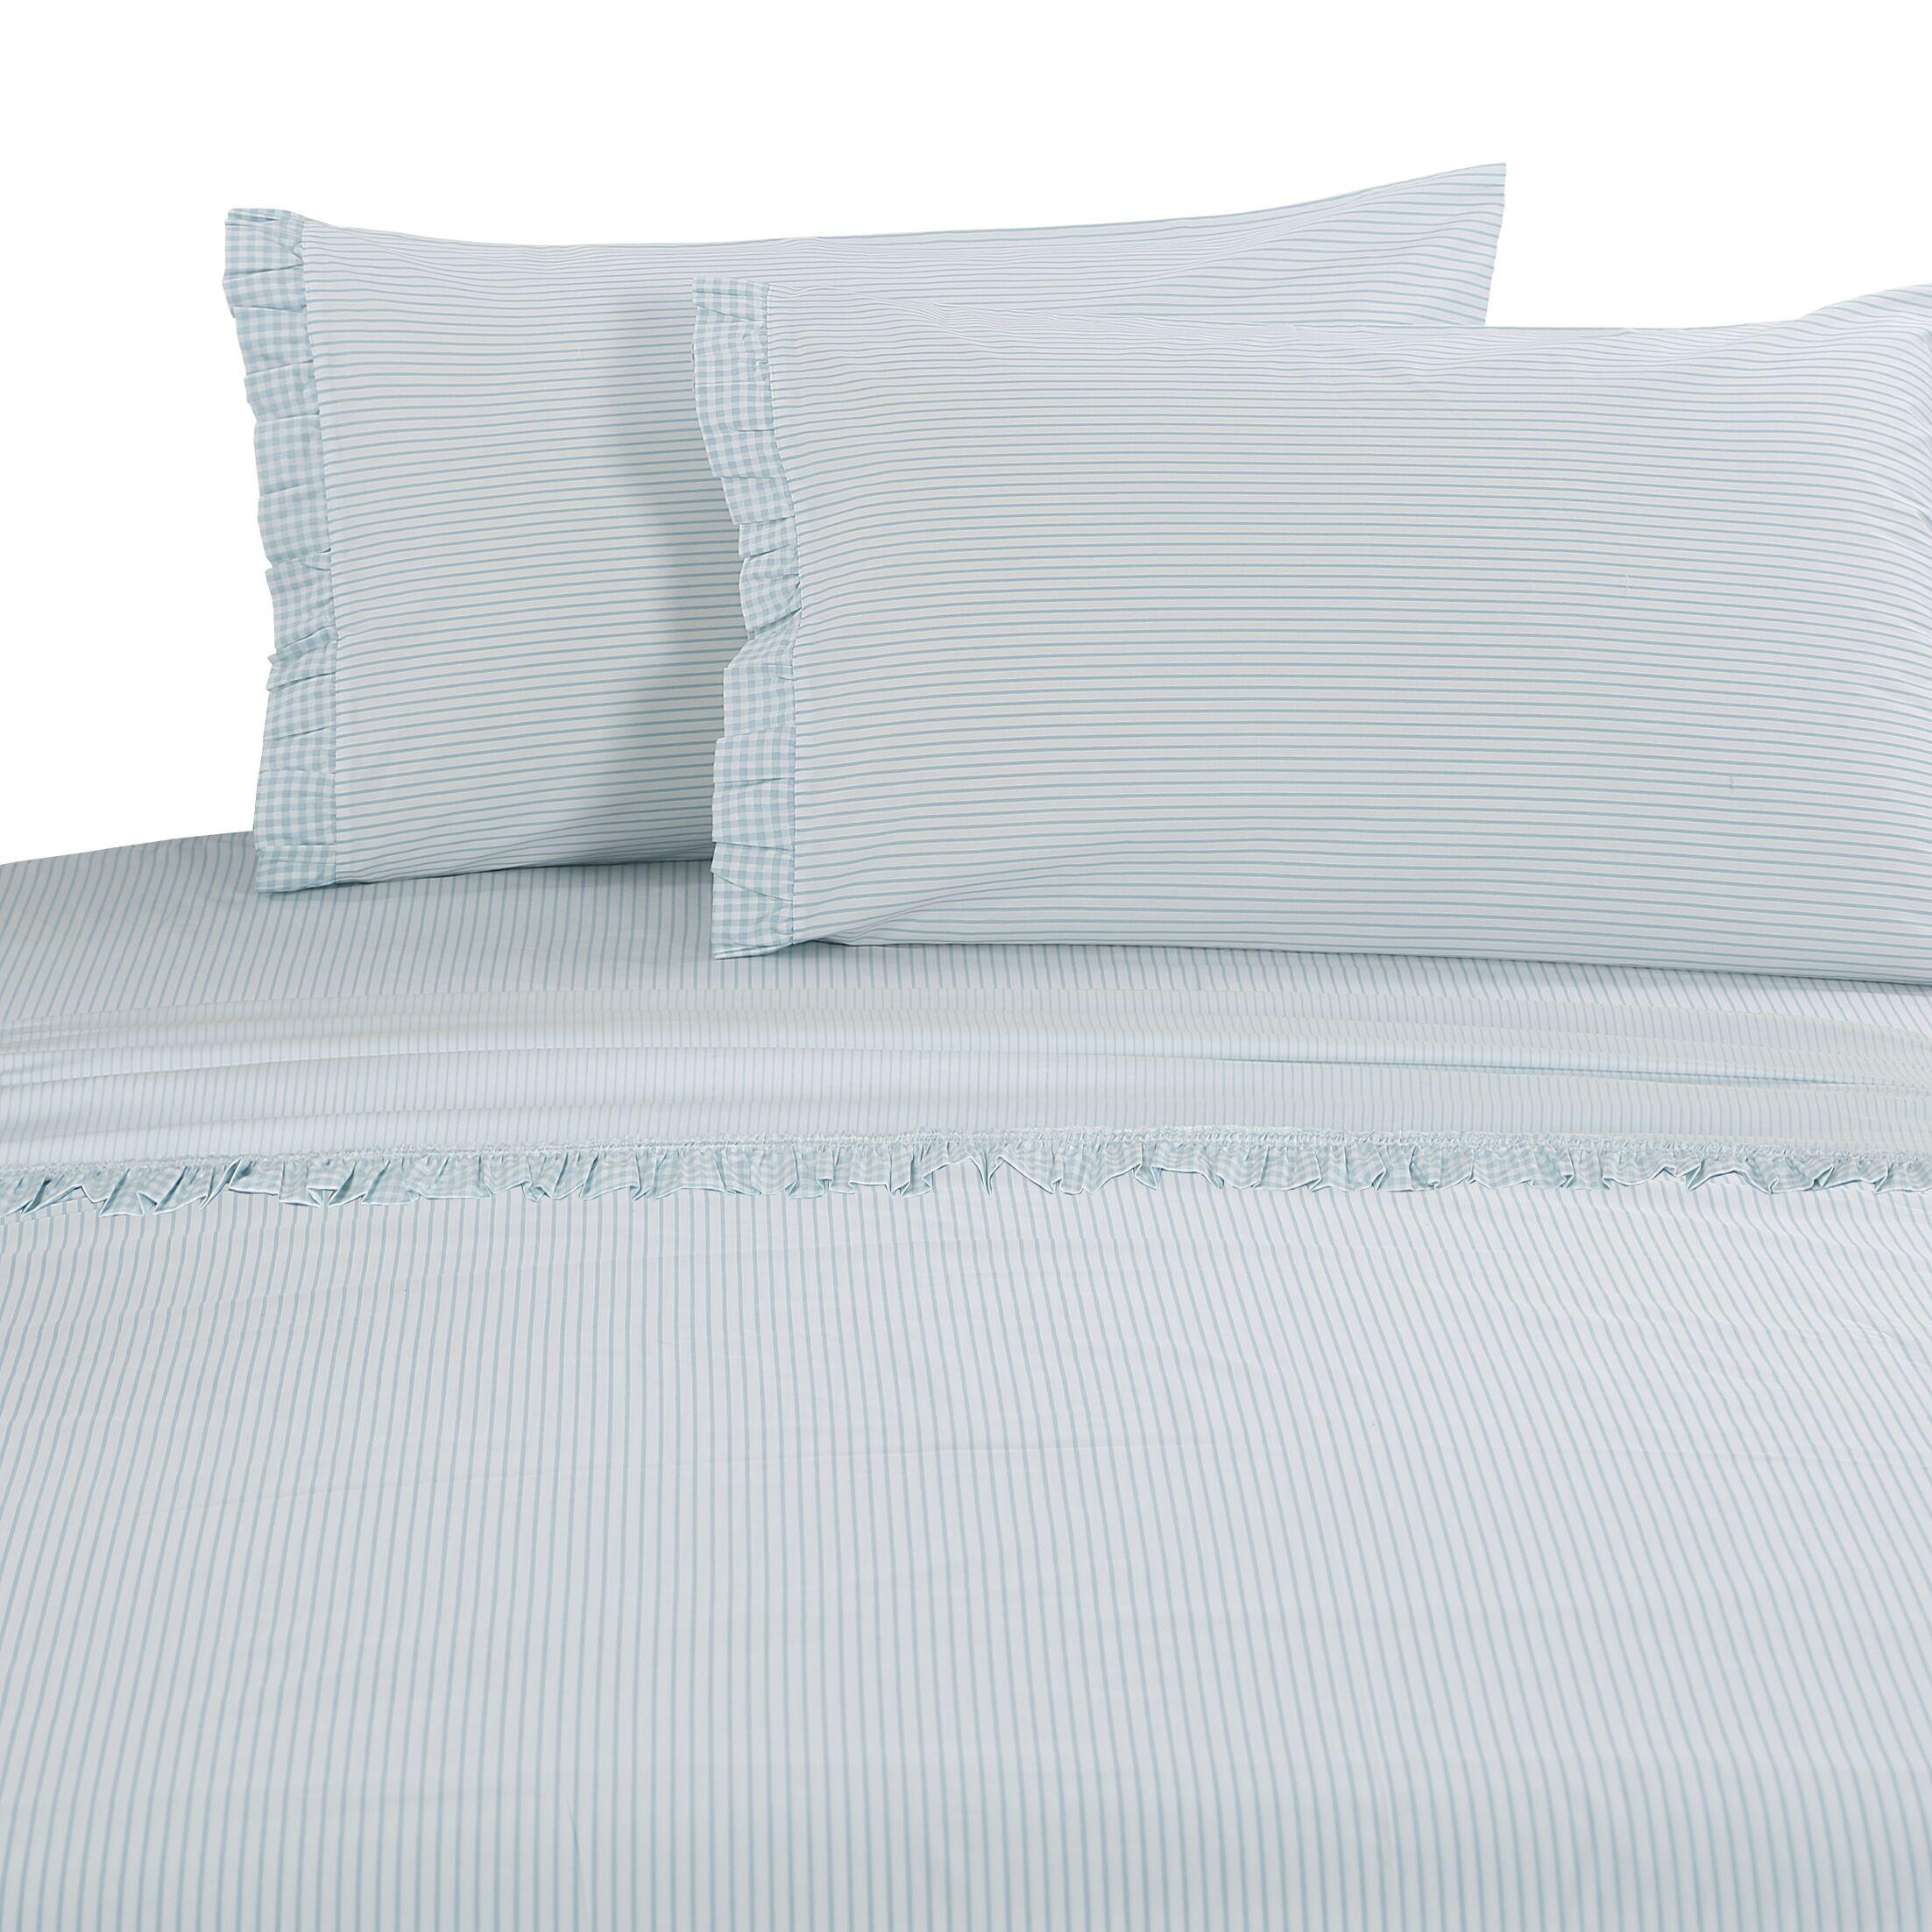 Faircloth Gingham Ruffle 300 Thread Count 100% Cotton Sheet Set Size: Queen, Color: Aqua